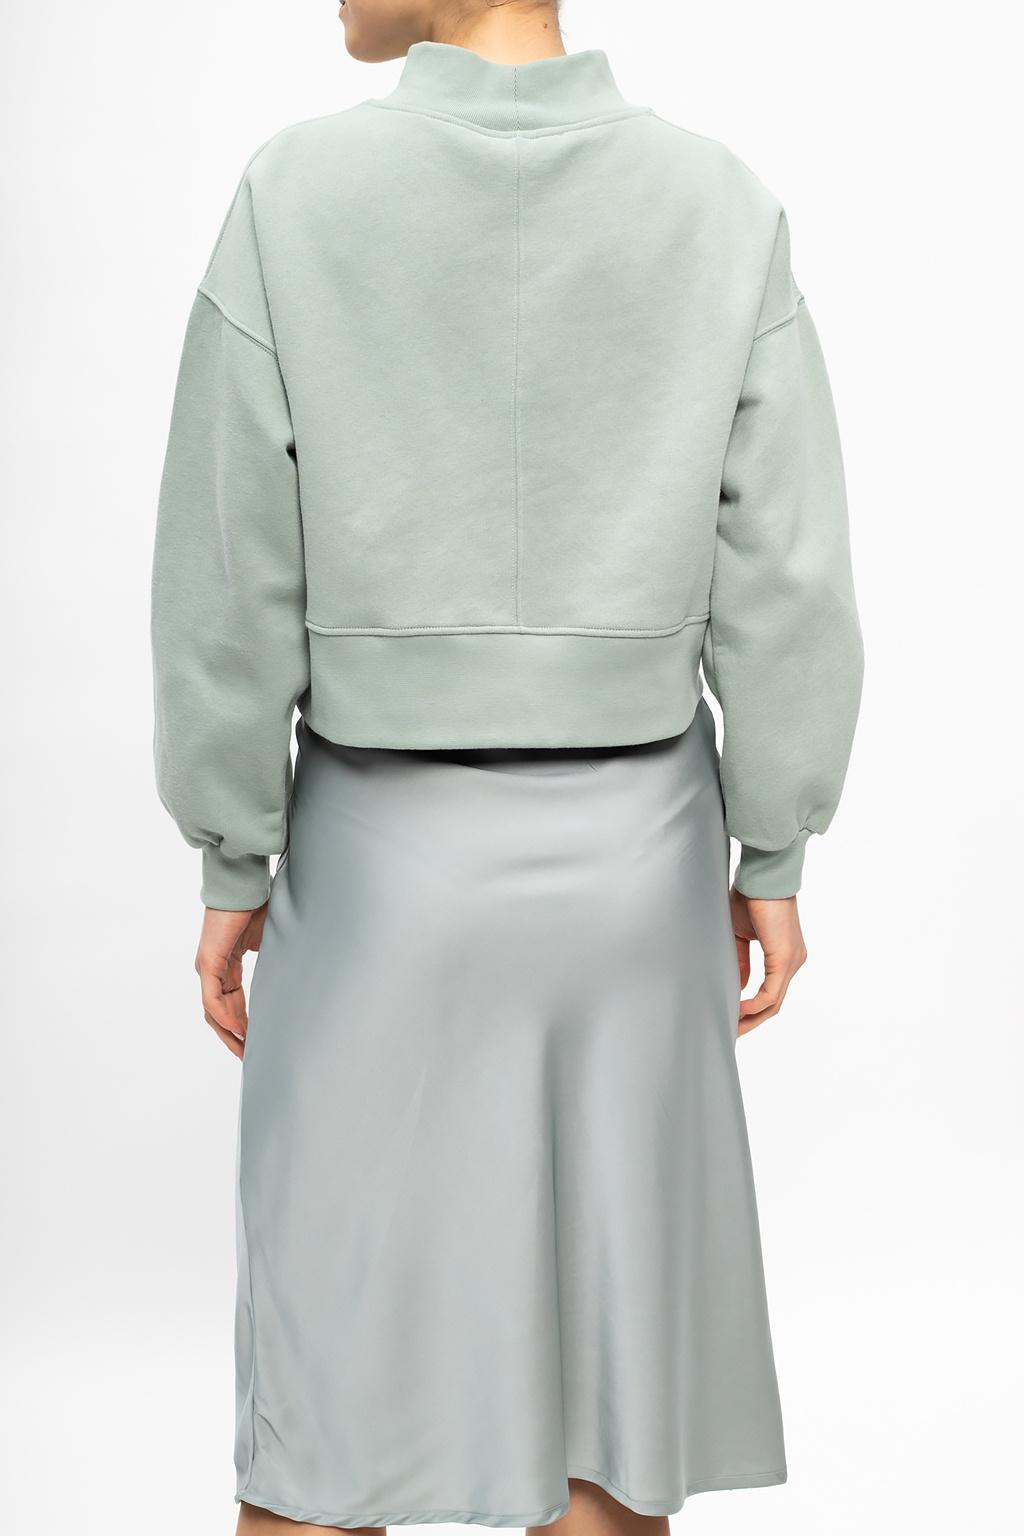 AllSaints 'Nevarra' sweatshirt & dress